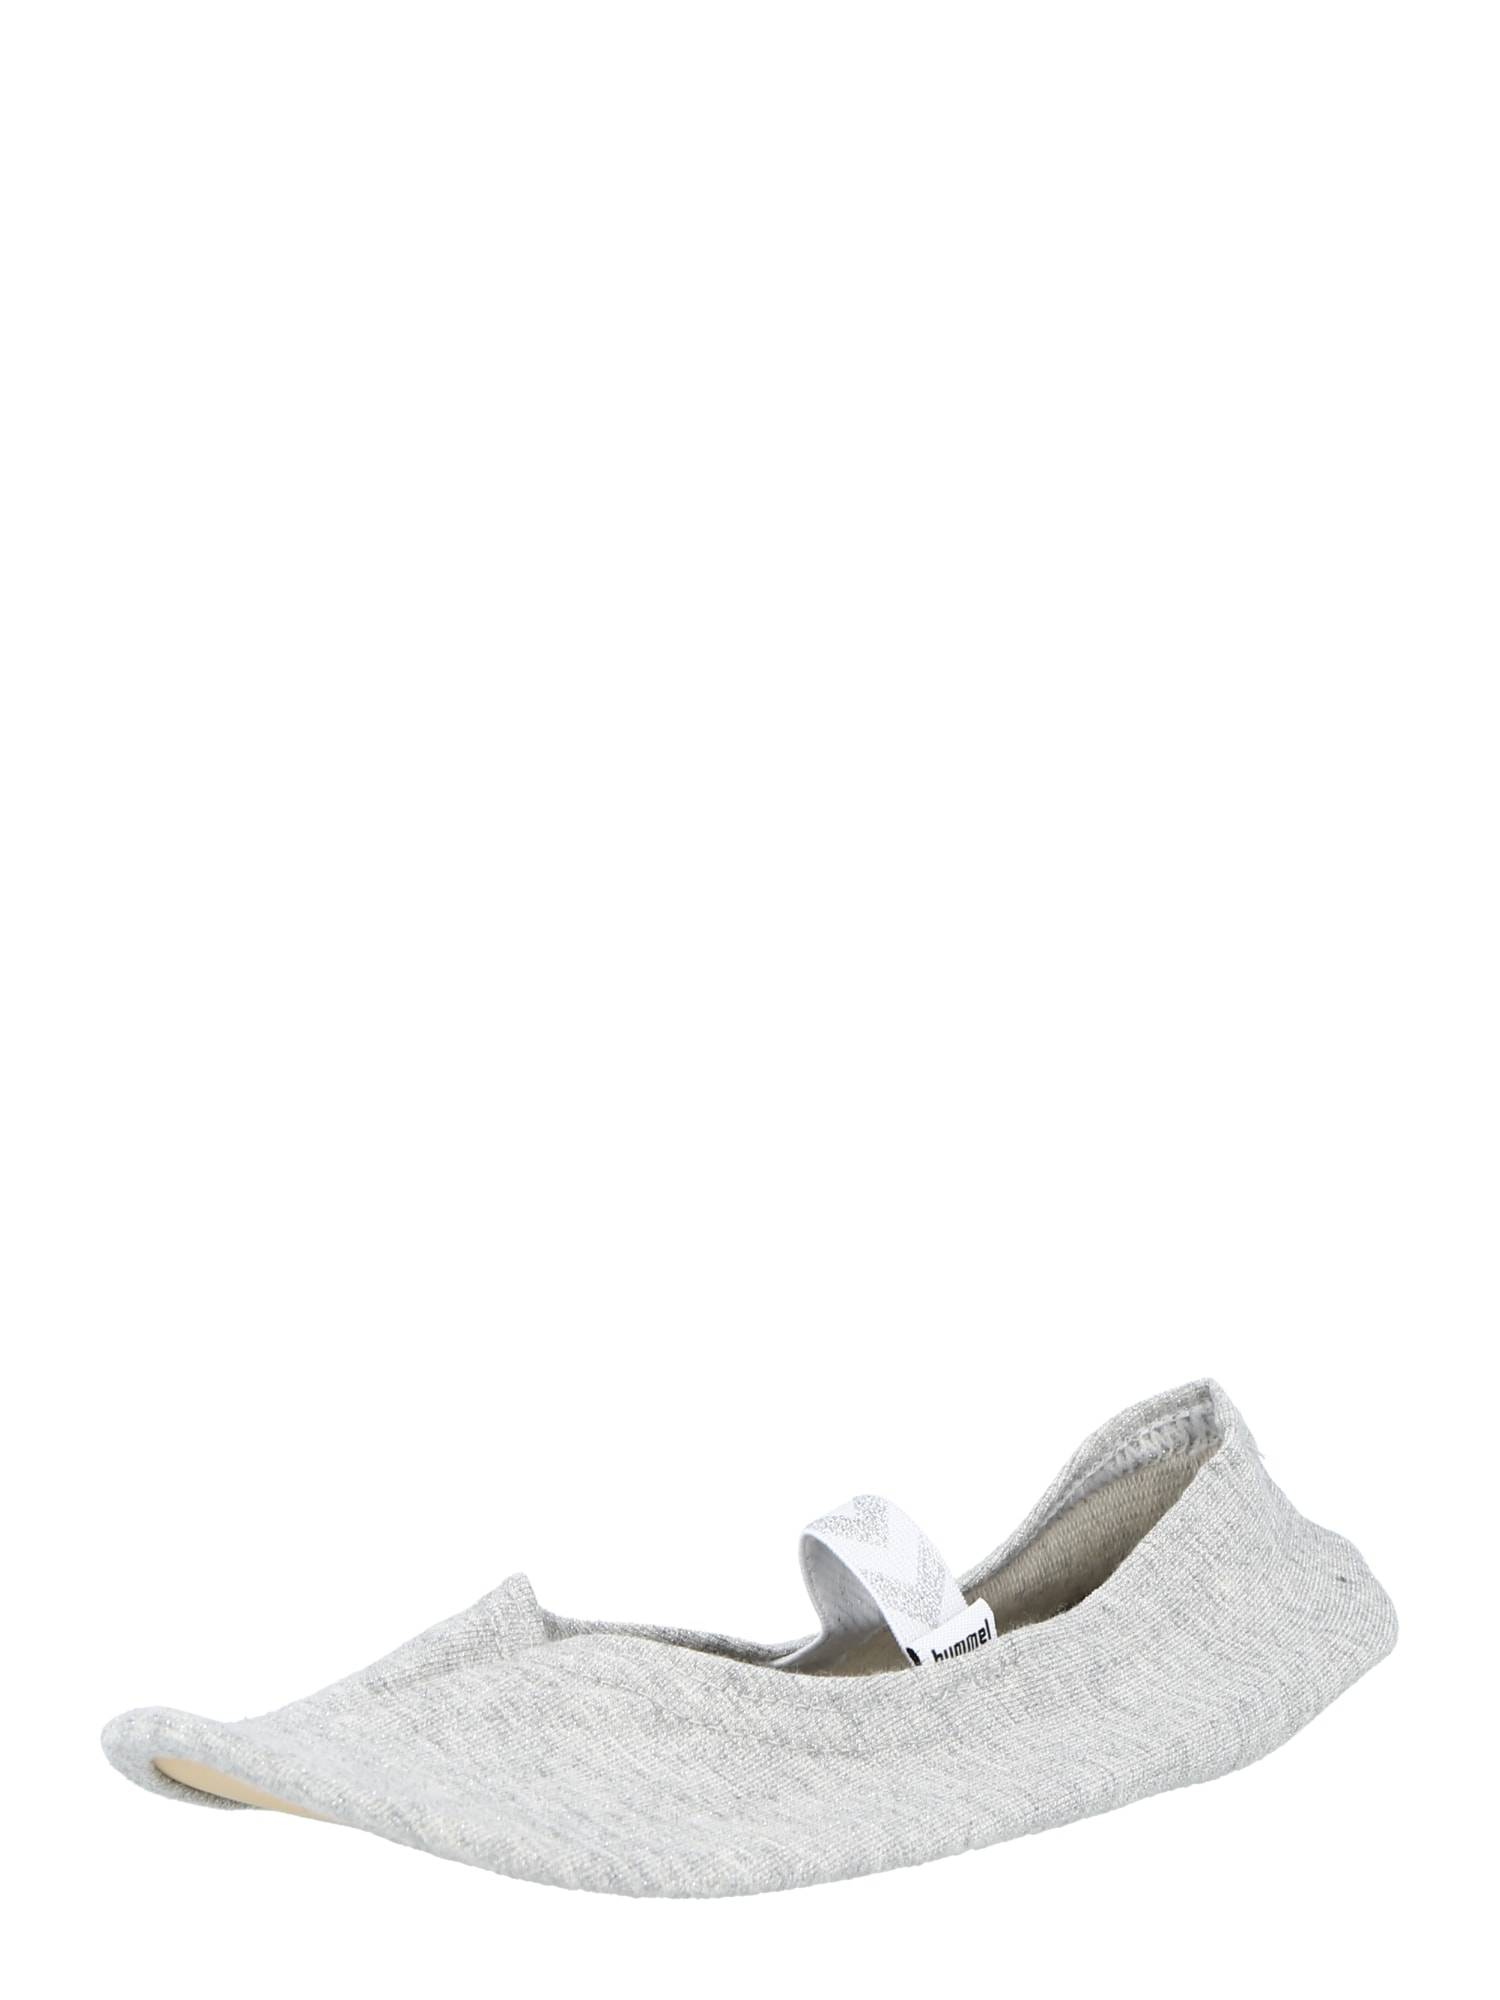 Hummel Chaussure de sport  - Gris - Taille: 35 - boy